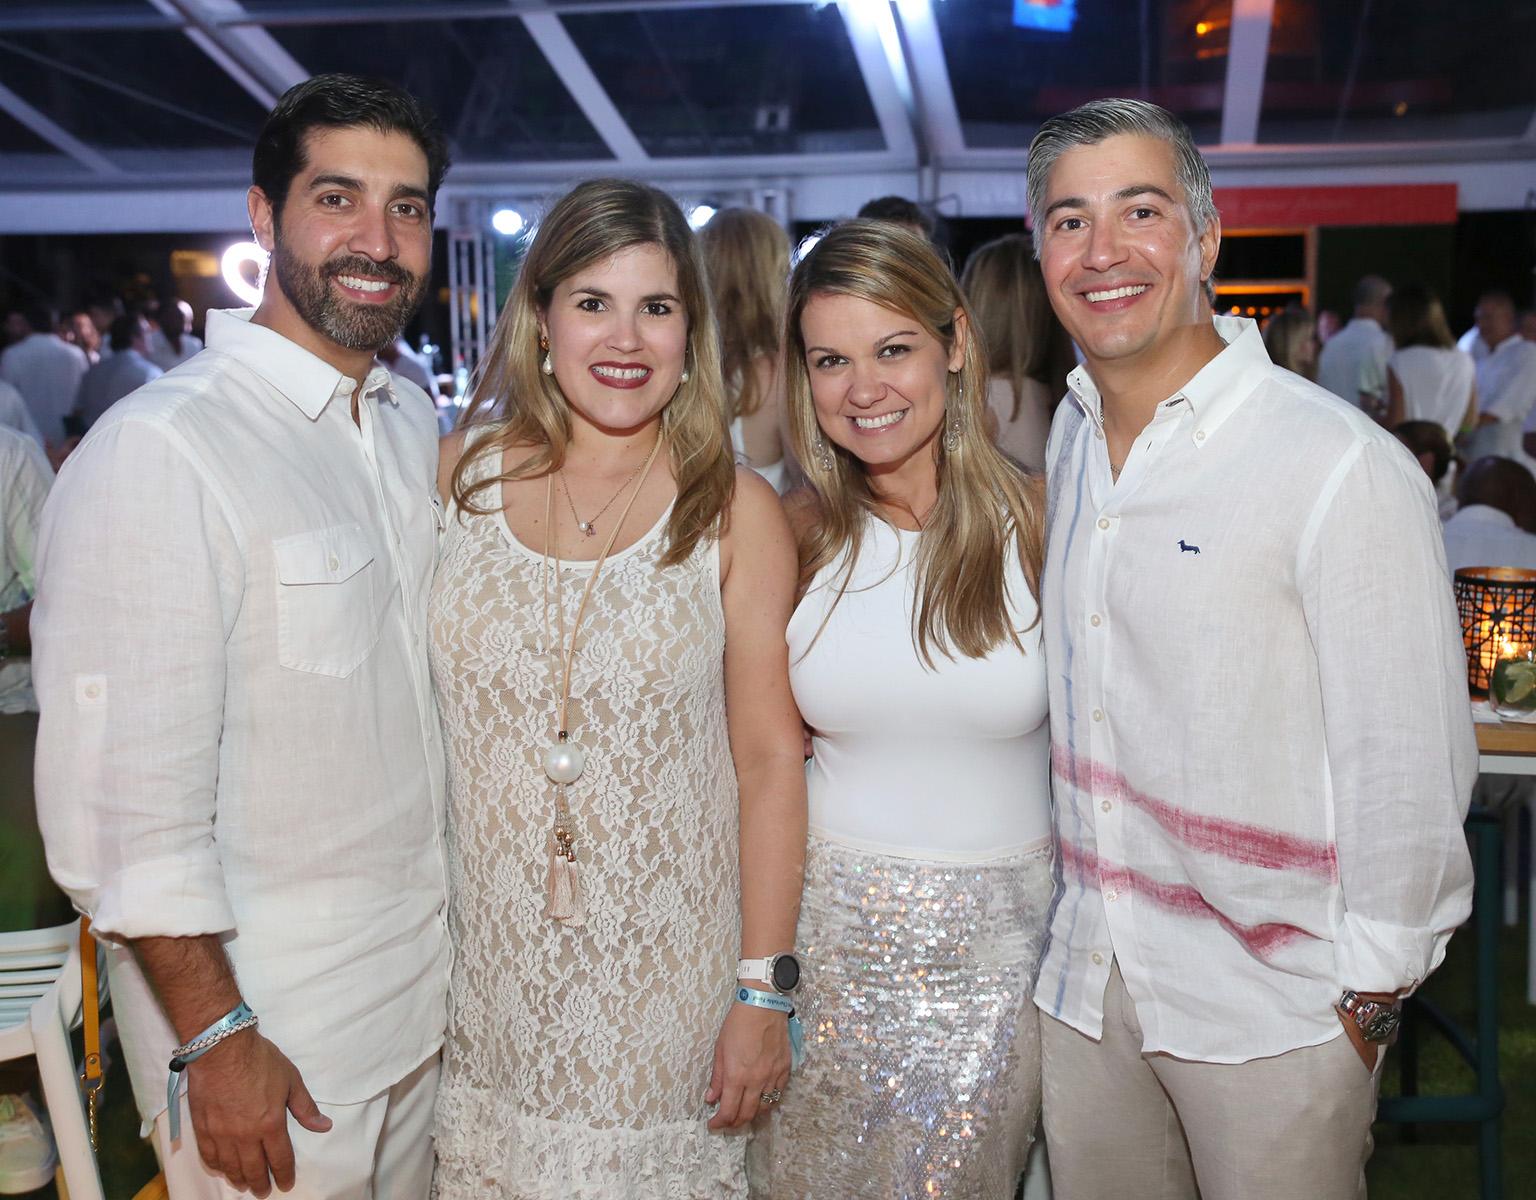 Enrique Rivera, Carla Capó, Cristina Gonzalez y Francisco Viejo. (José R. Pérez Centeno)